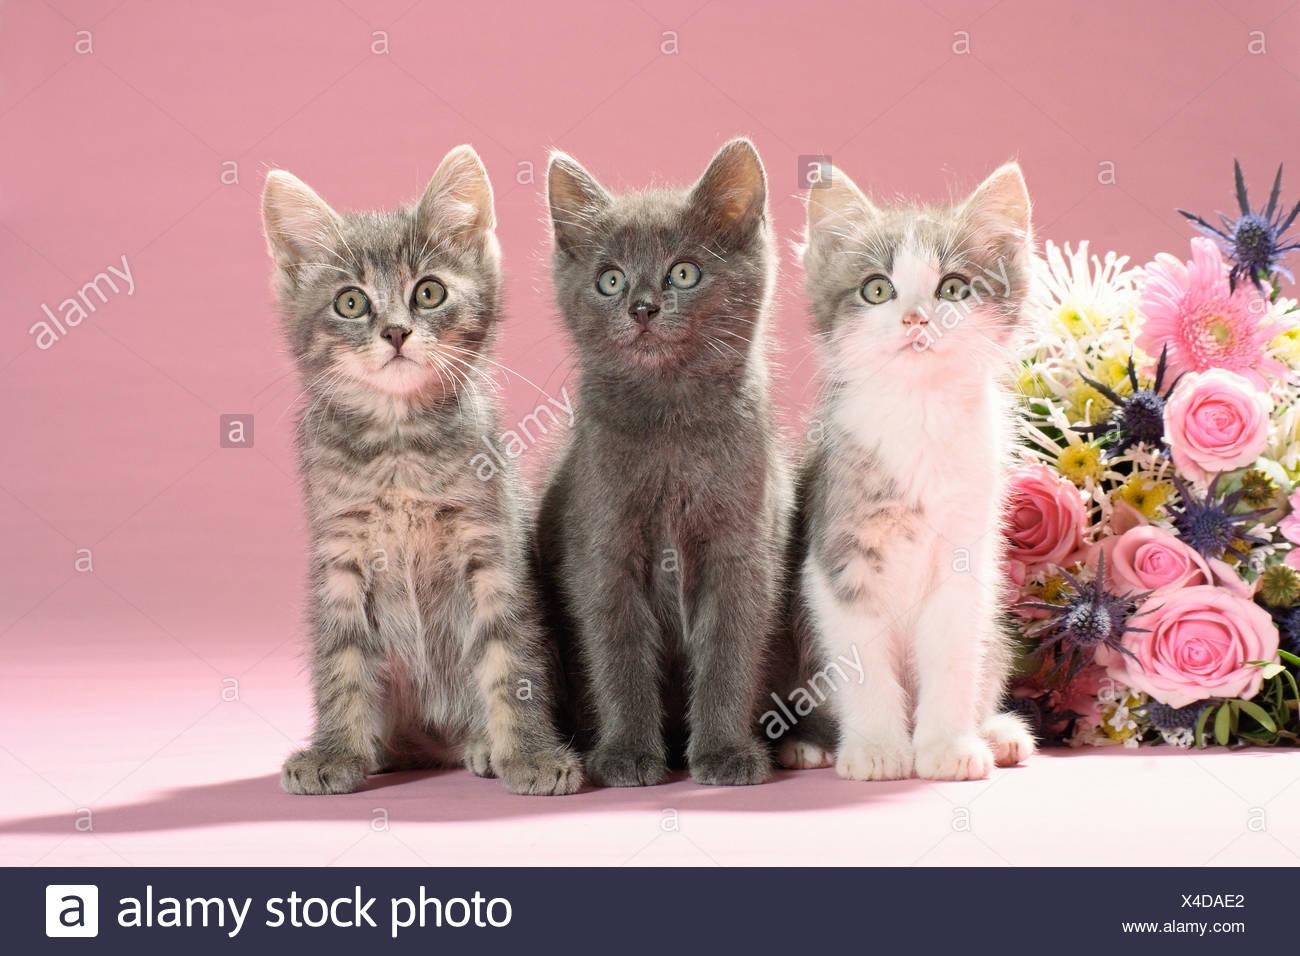 Three Cute Kittens Flowers Stock Photos & Three Cute Kittens Flowers ...